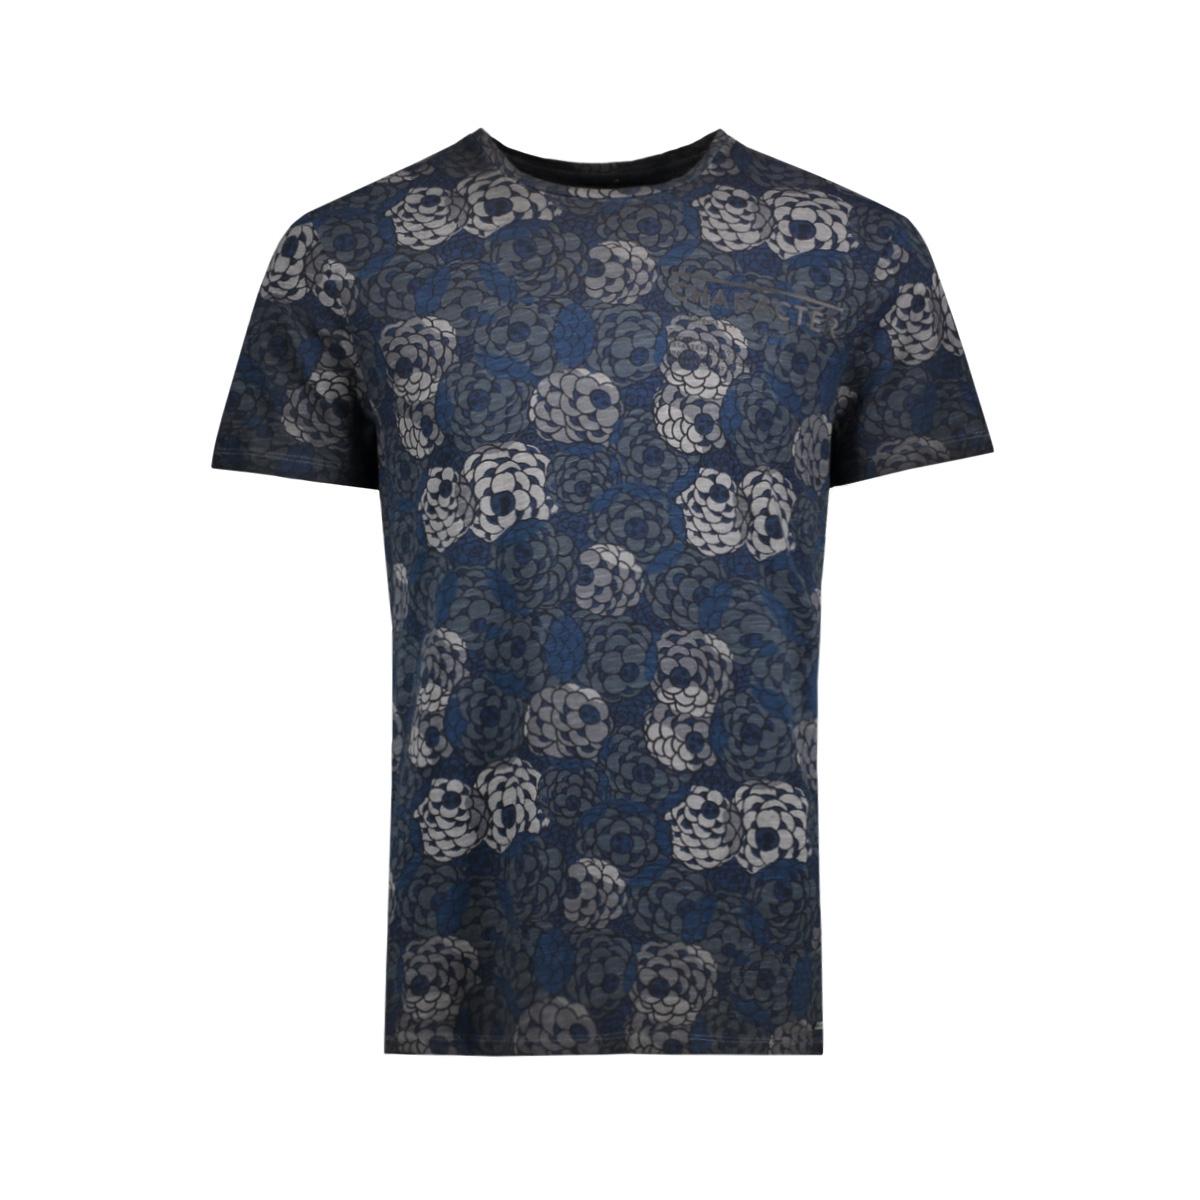 s81005 garcia t-shirt 2596 raven